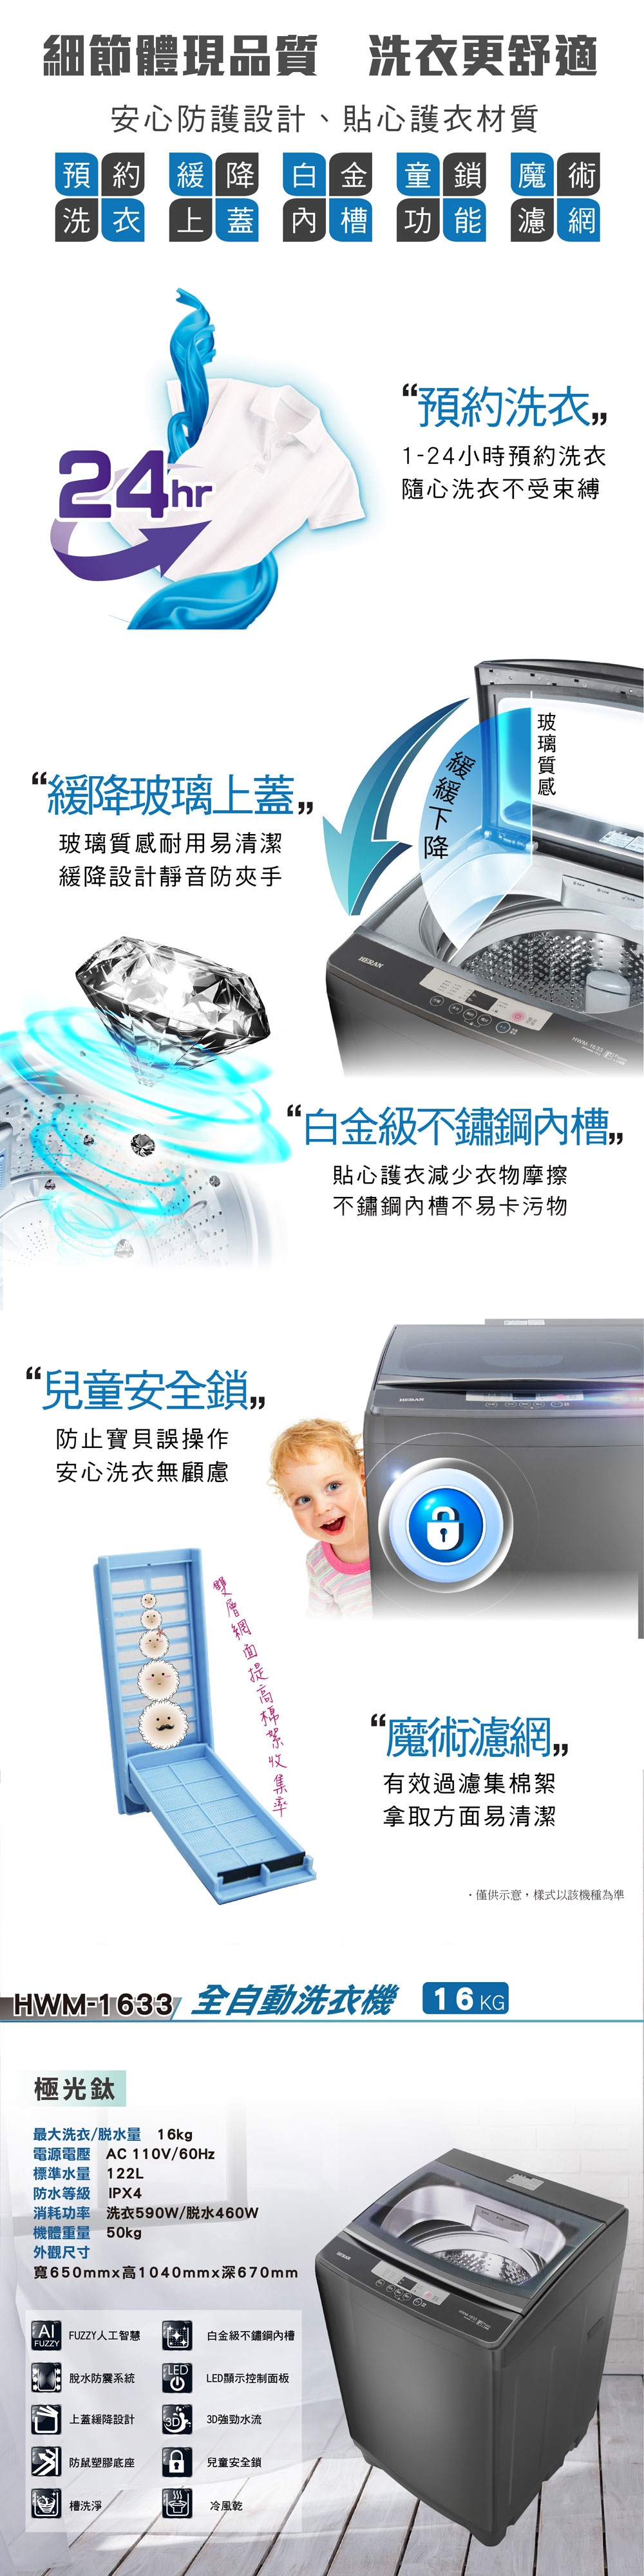 HERAN禾聯 16KG 定頻直立式洗衣機HWM-1633